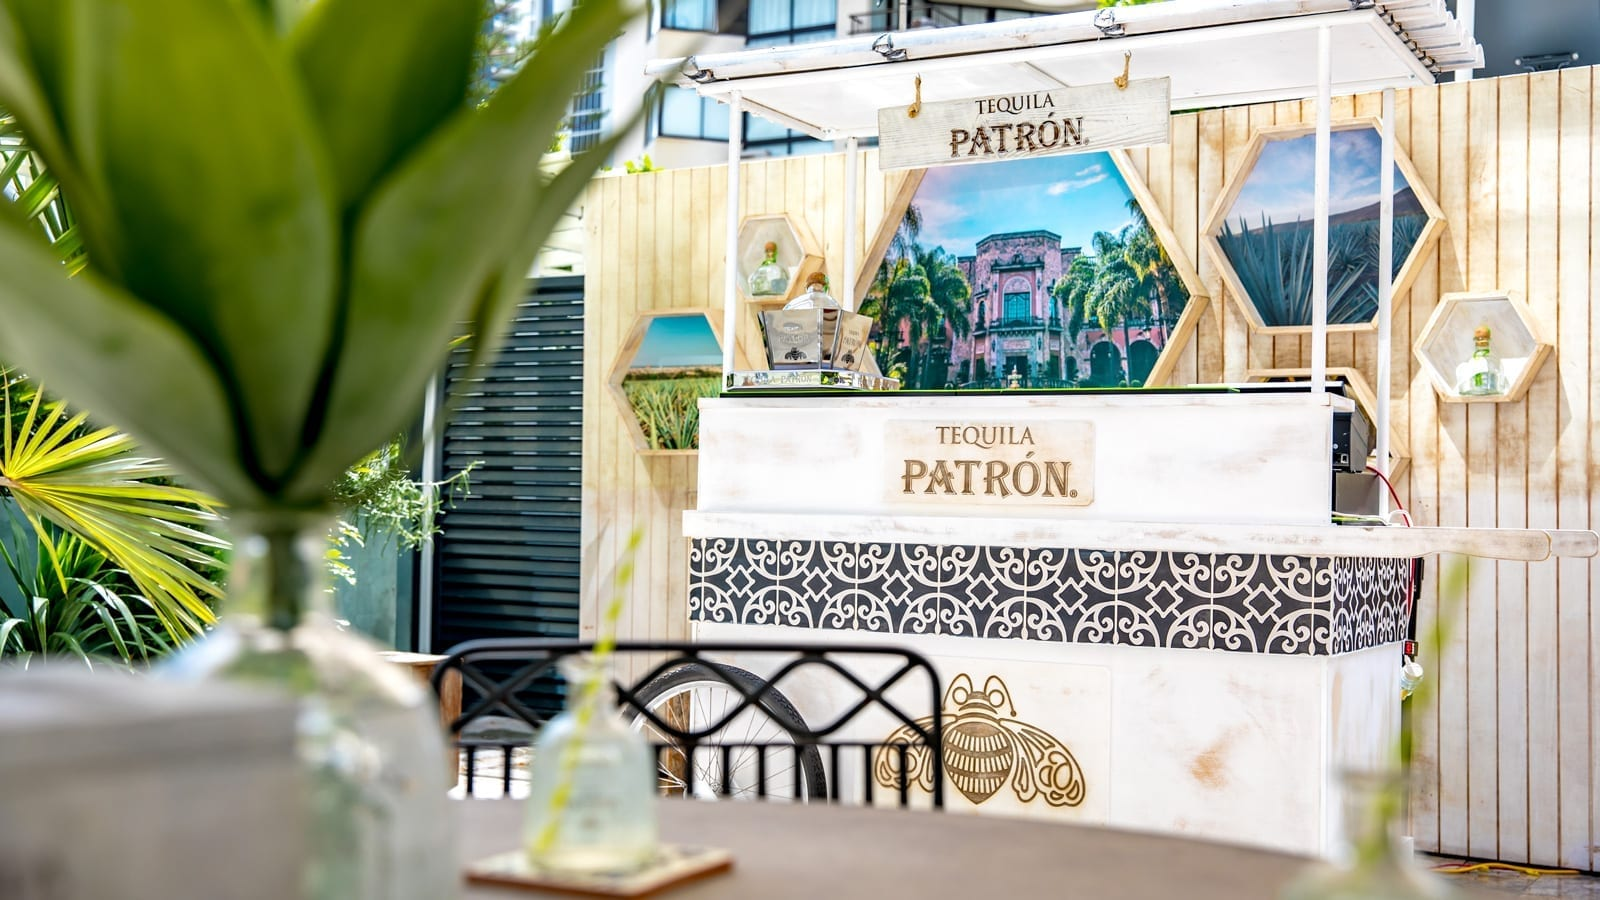 the-island-patron3  - the island patron3 - Patron Courtyard